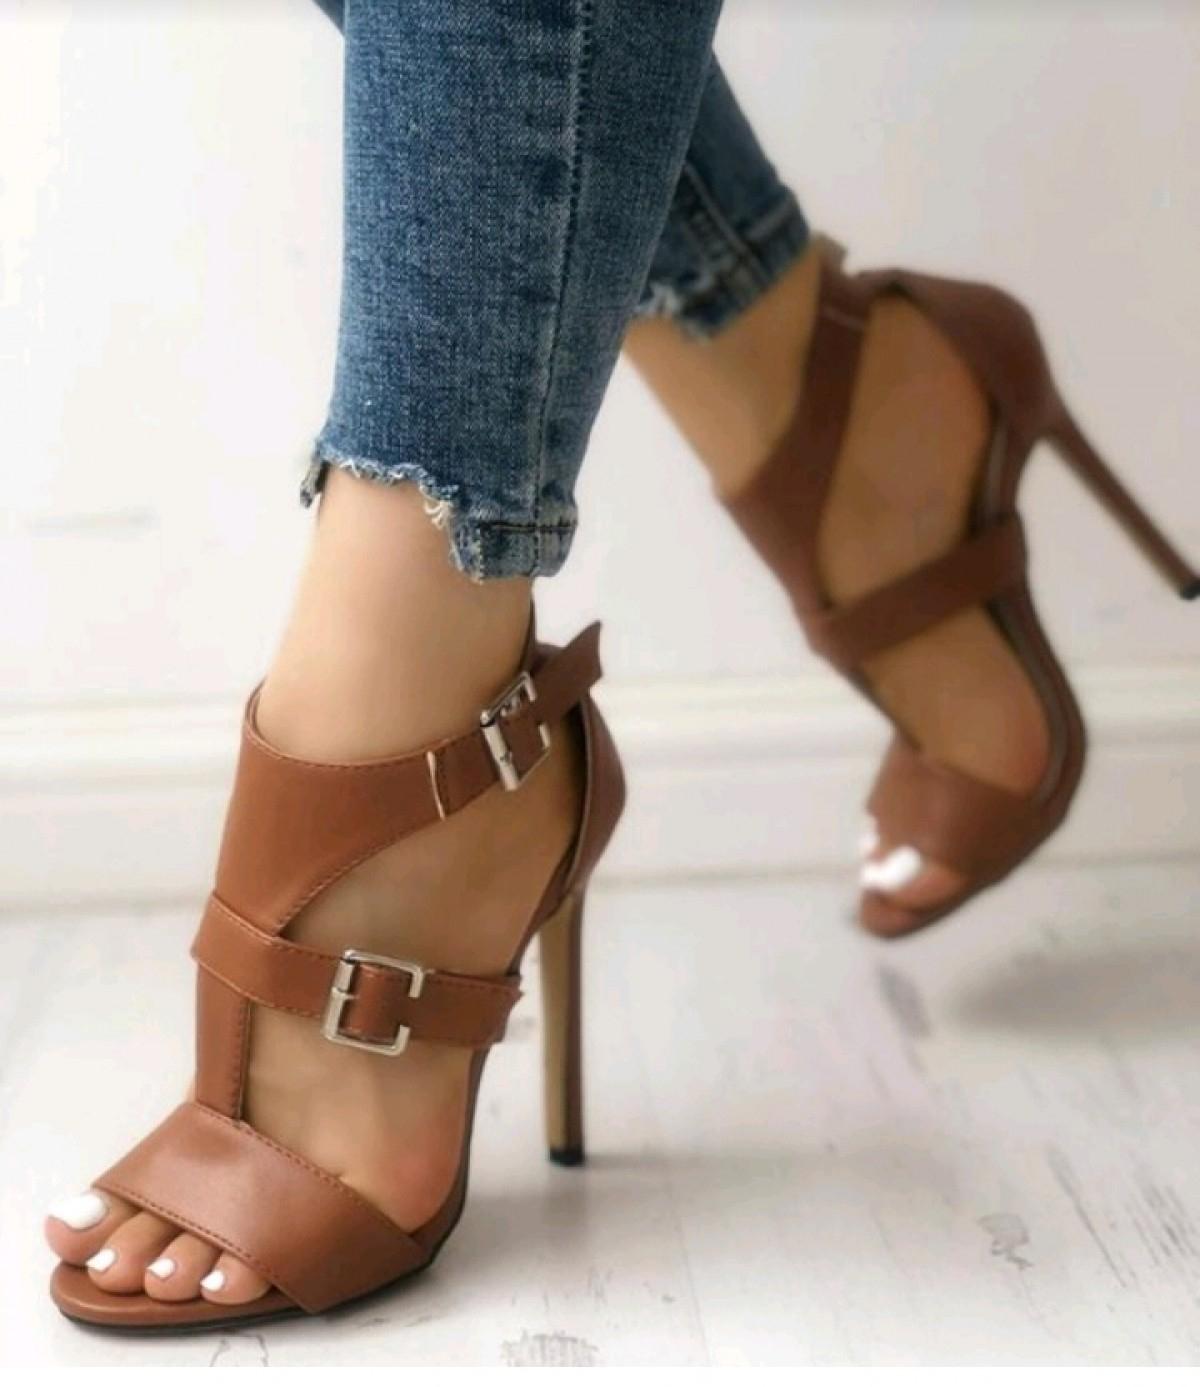 598372f68aa3 High Heels Sandals for sale in Washington Boulevard Kingston St ...